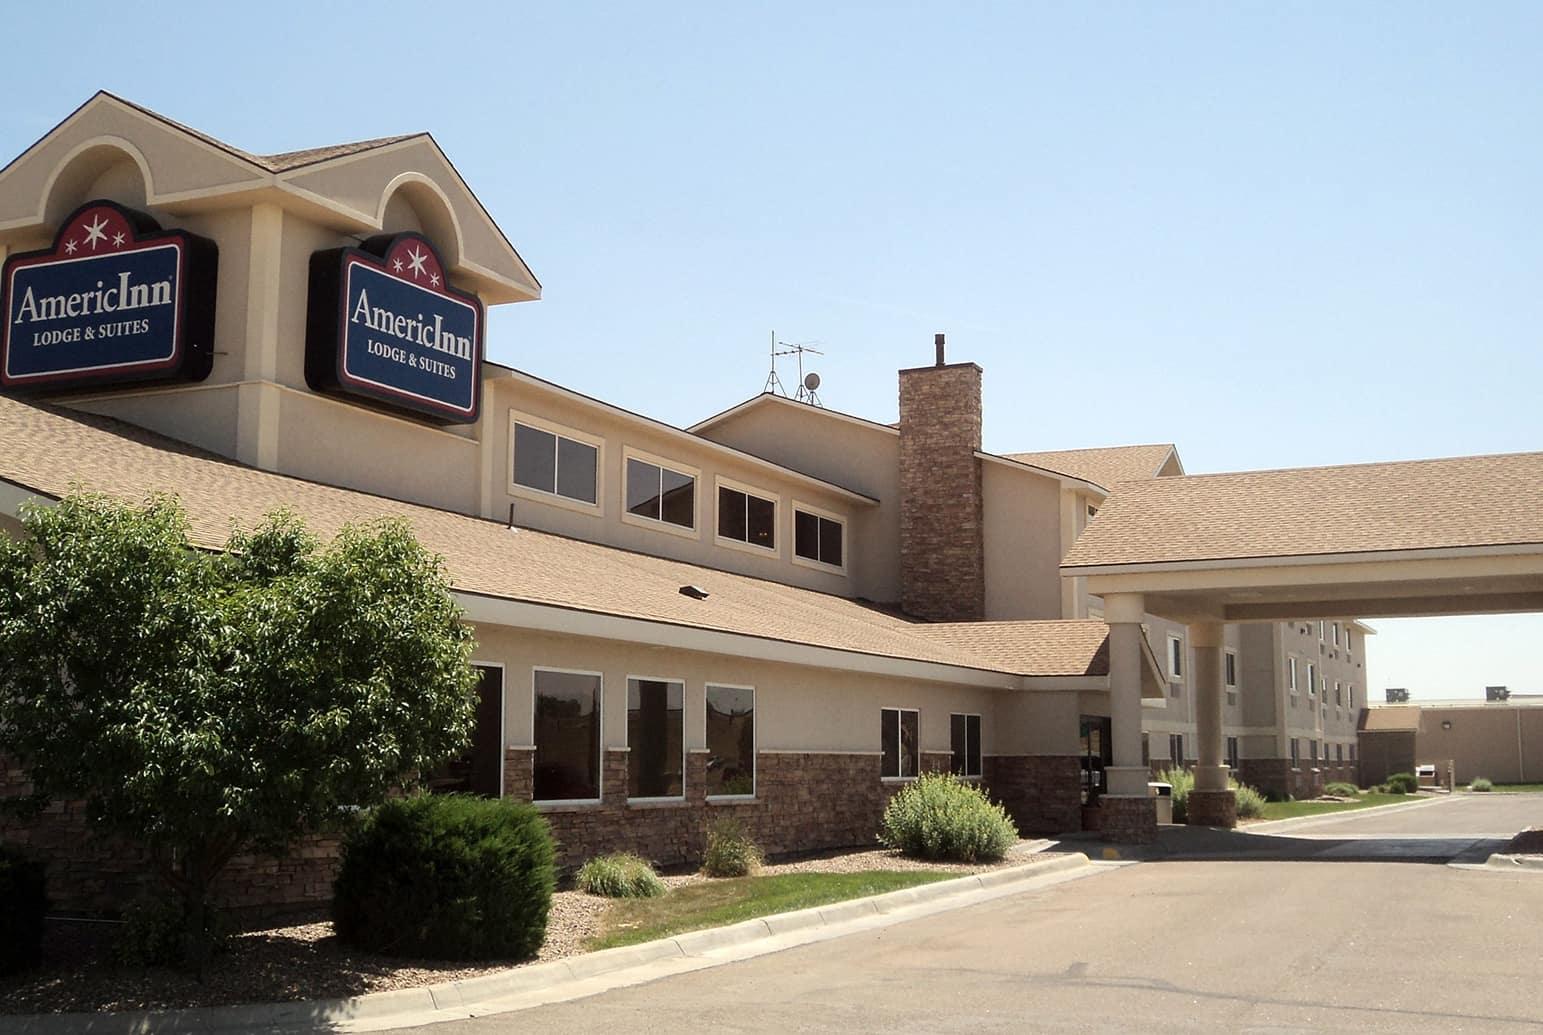 Hotels In Garden City Ks >> Americinn By Wyndham Garden City Garden City Ks Hotels